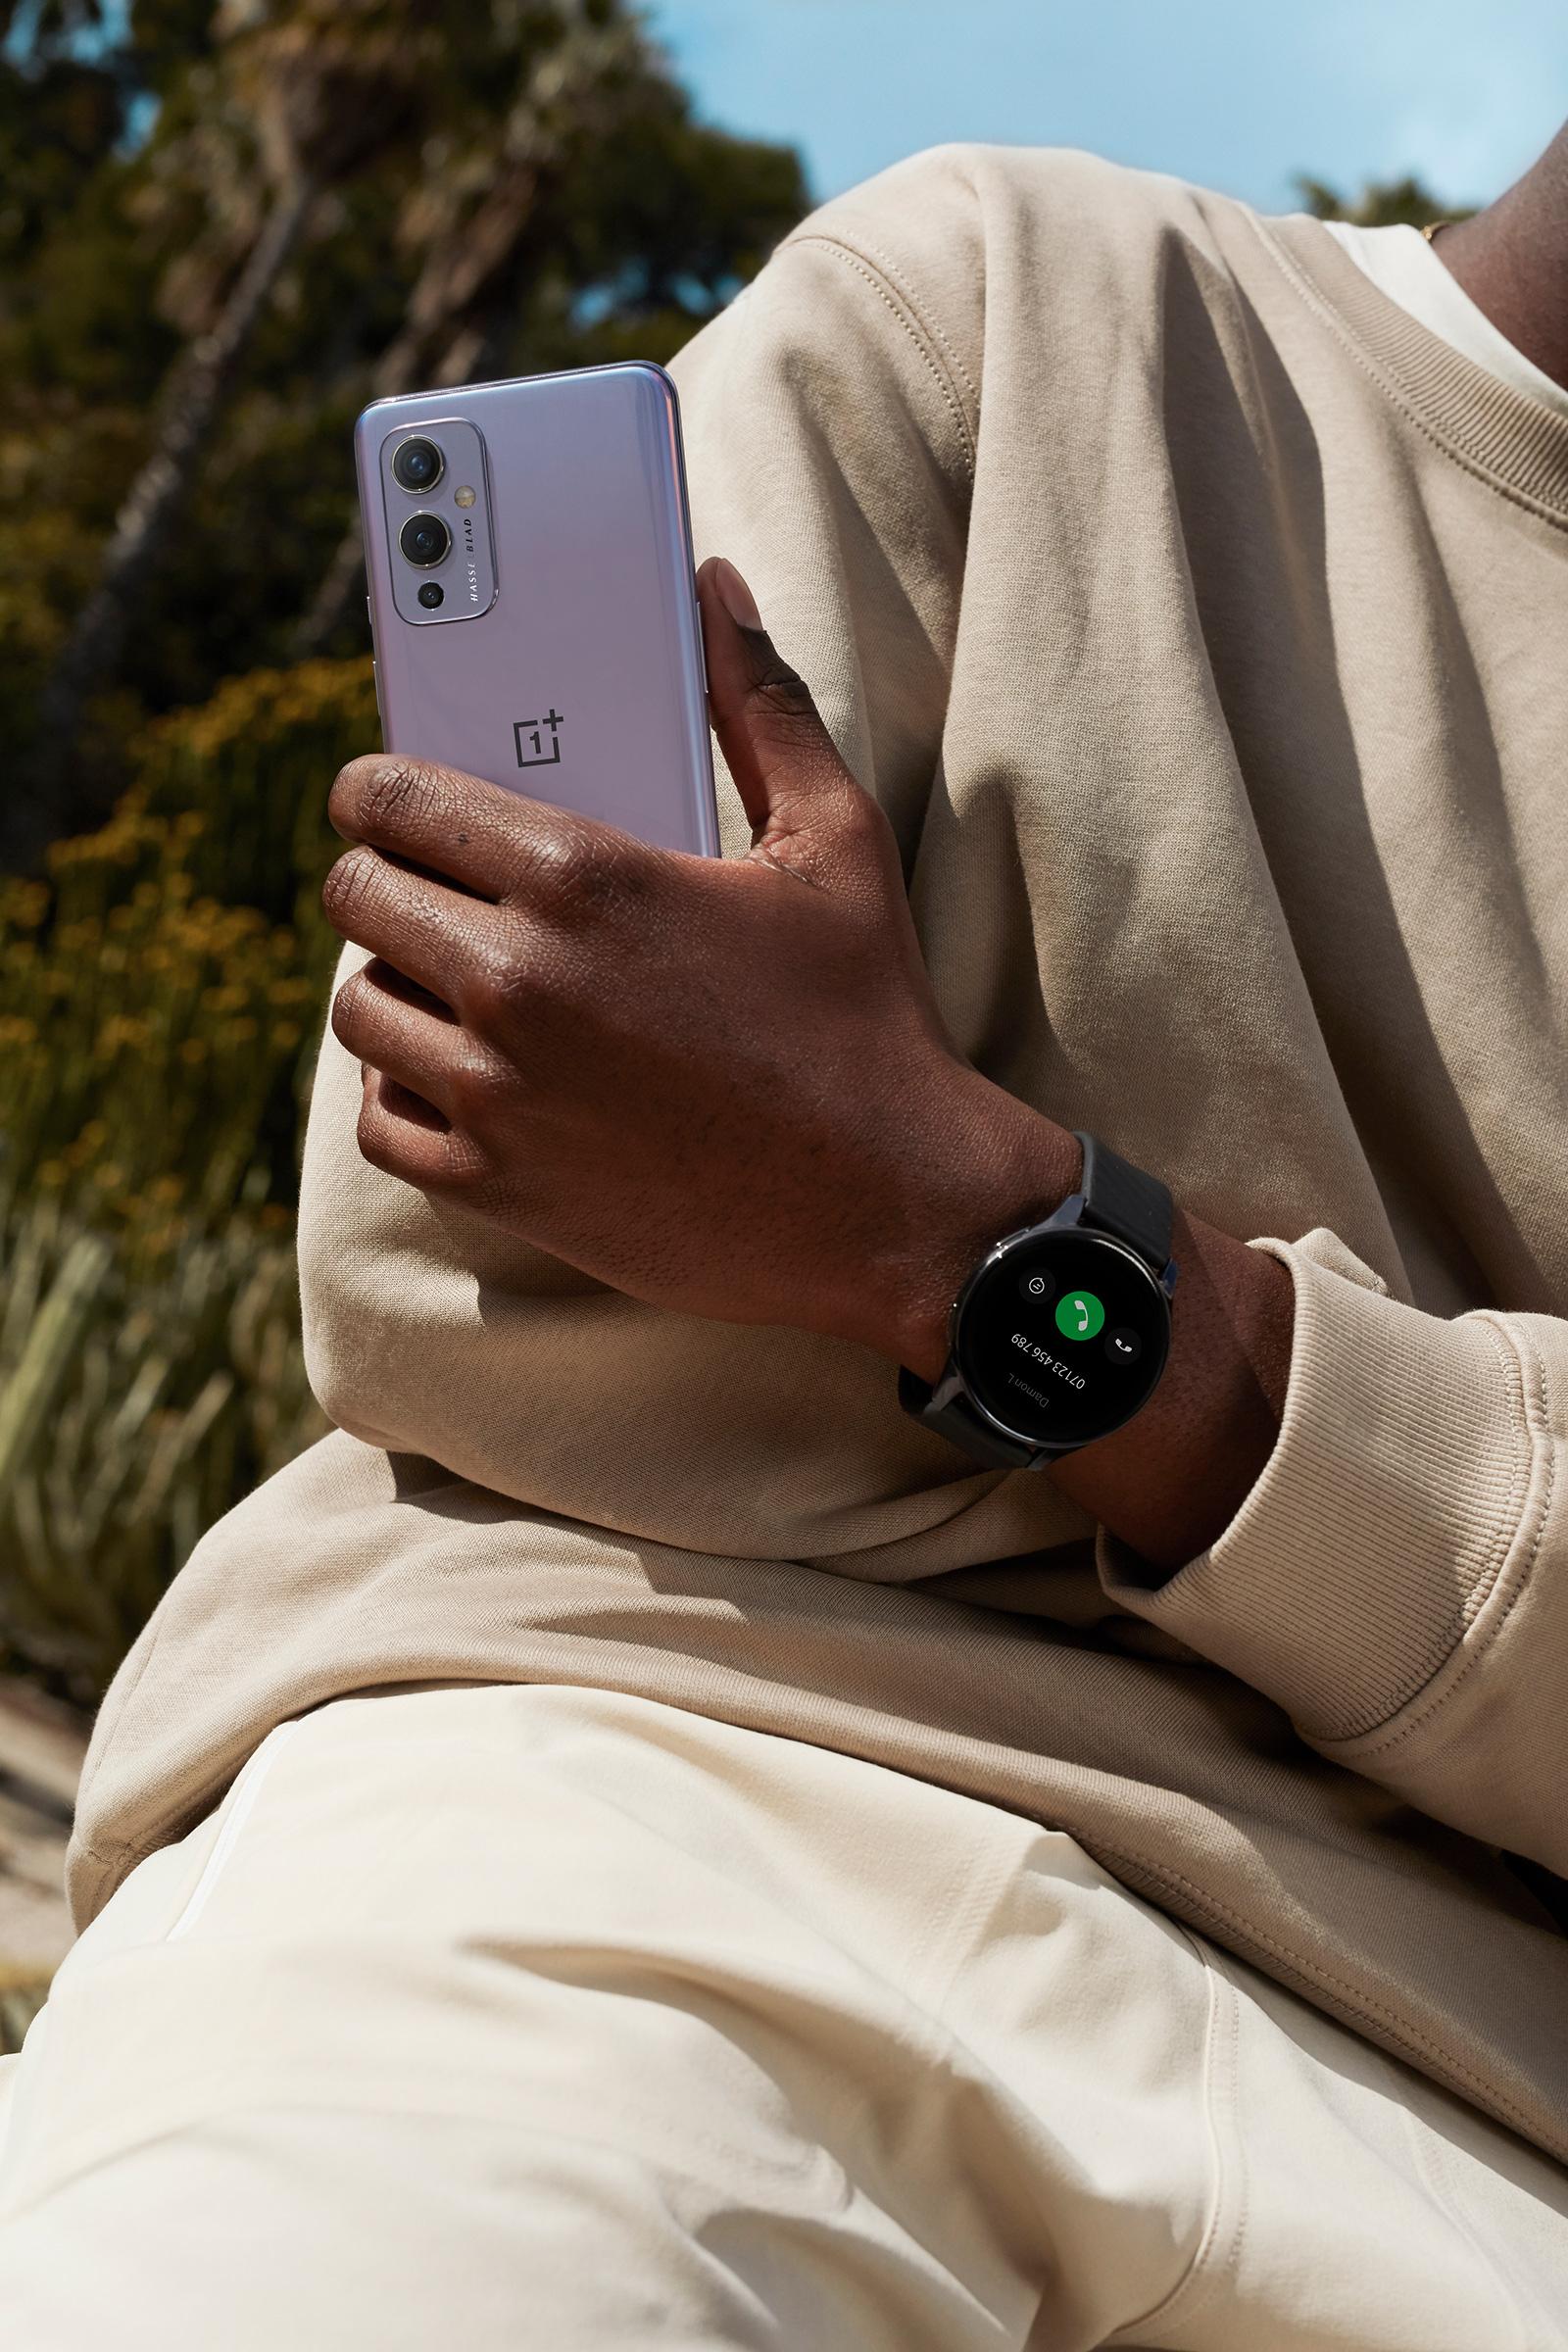 OnePlus Watch lifestyle revealed